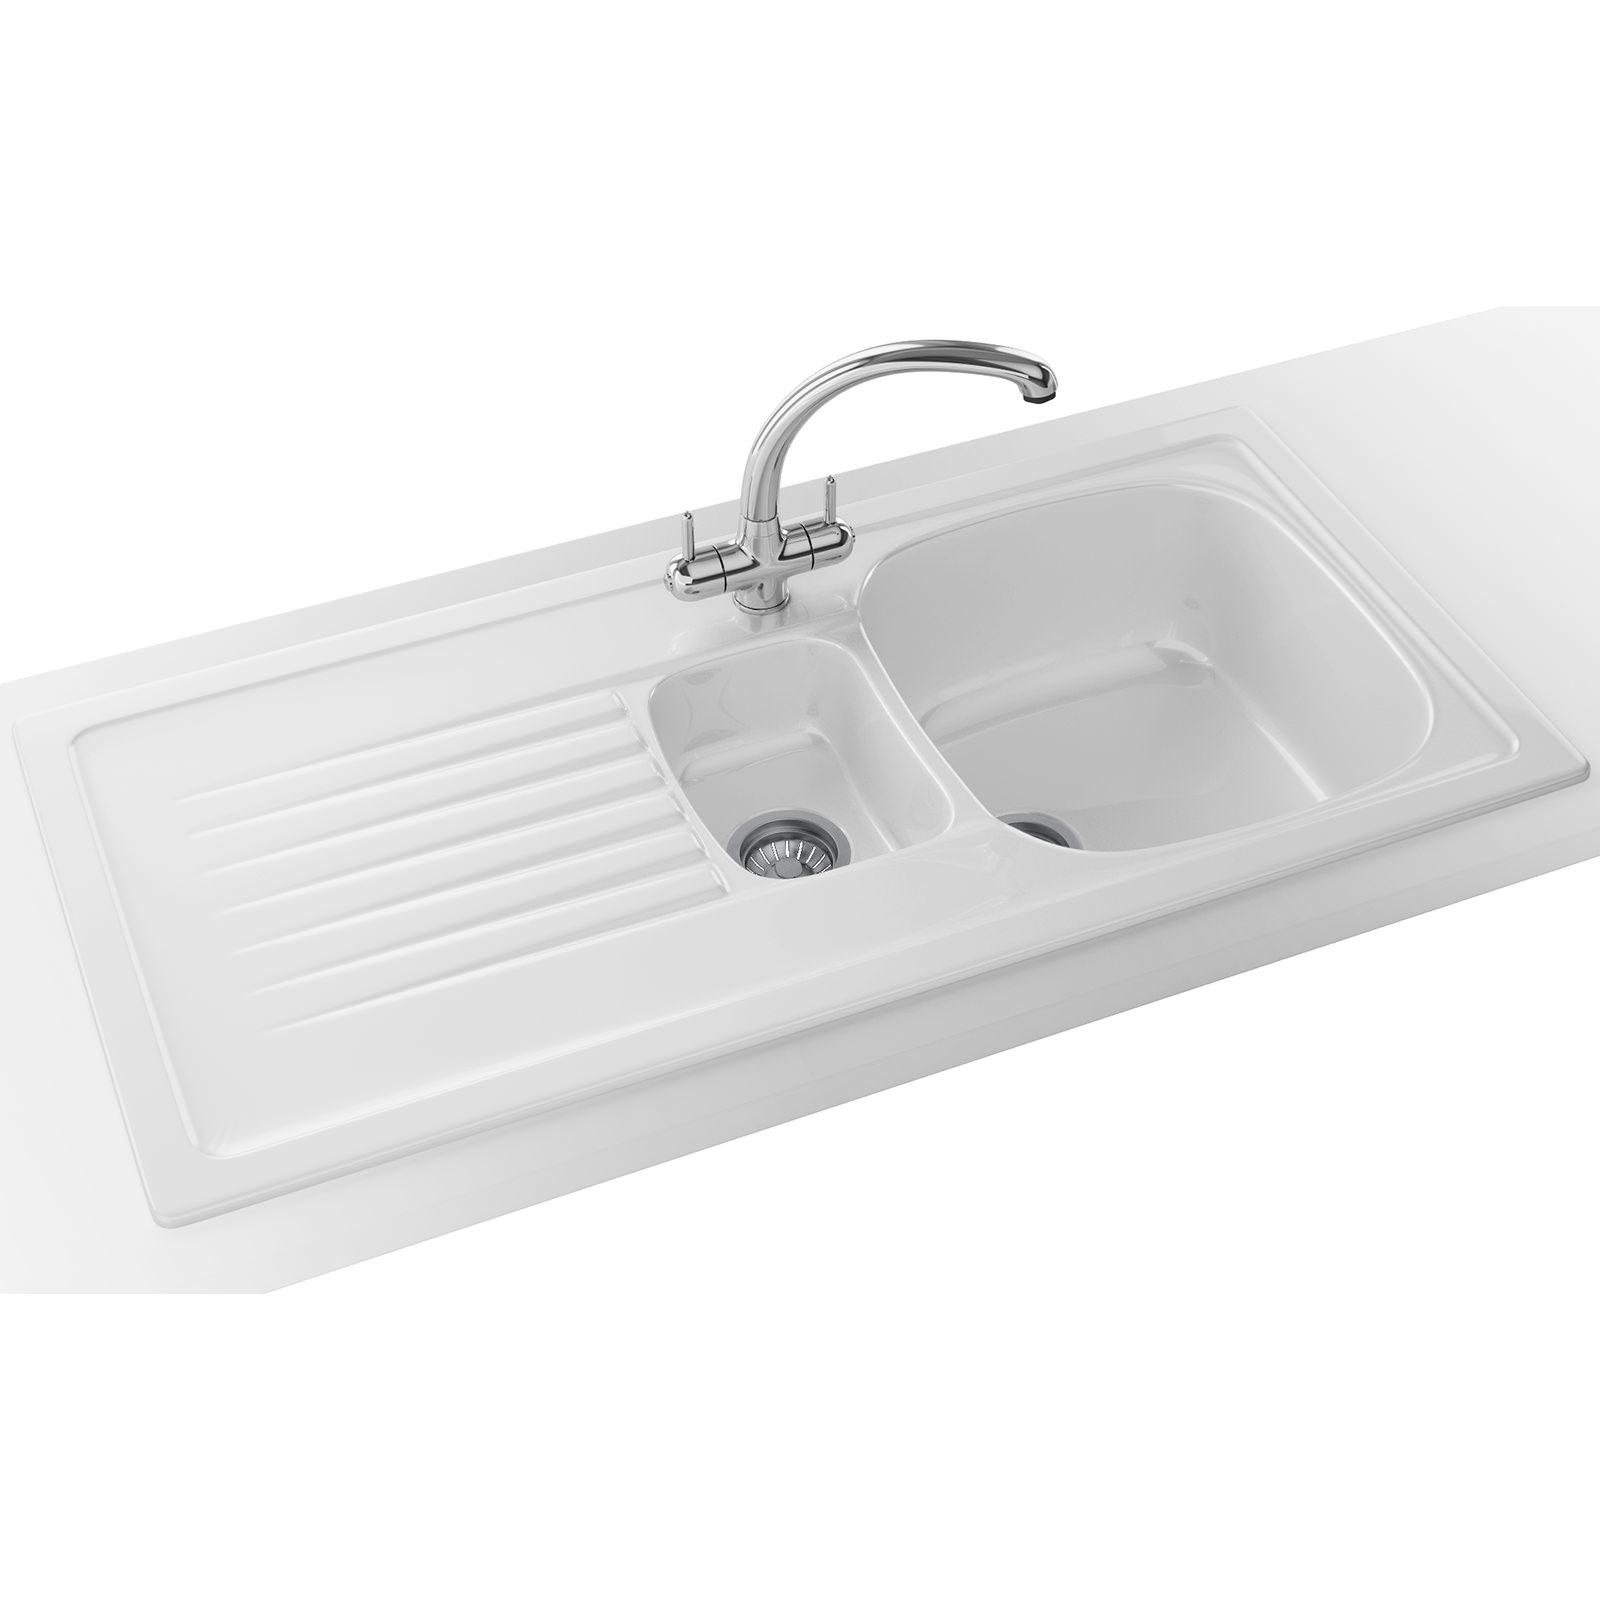 white kitchen sink islans franke elba propack elk 651 ceramic inset and